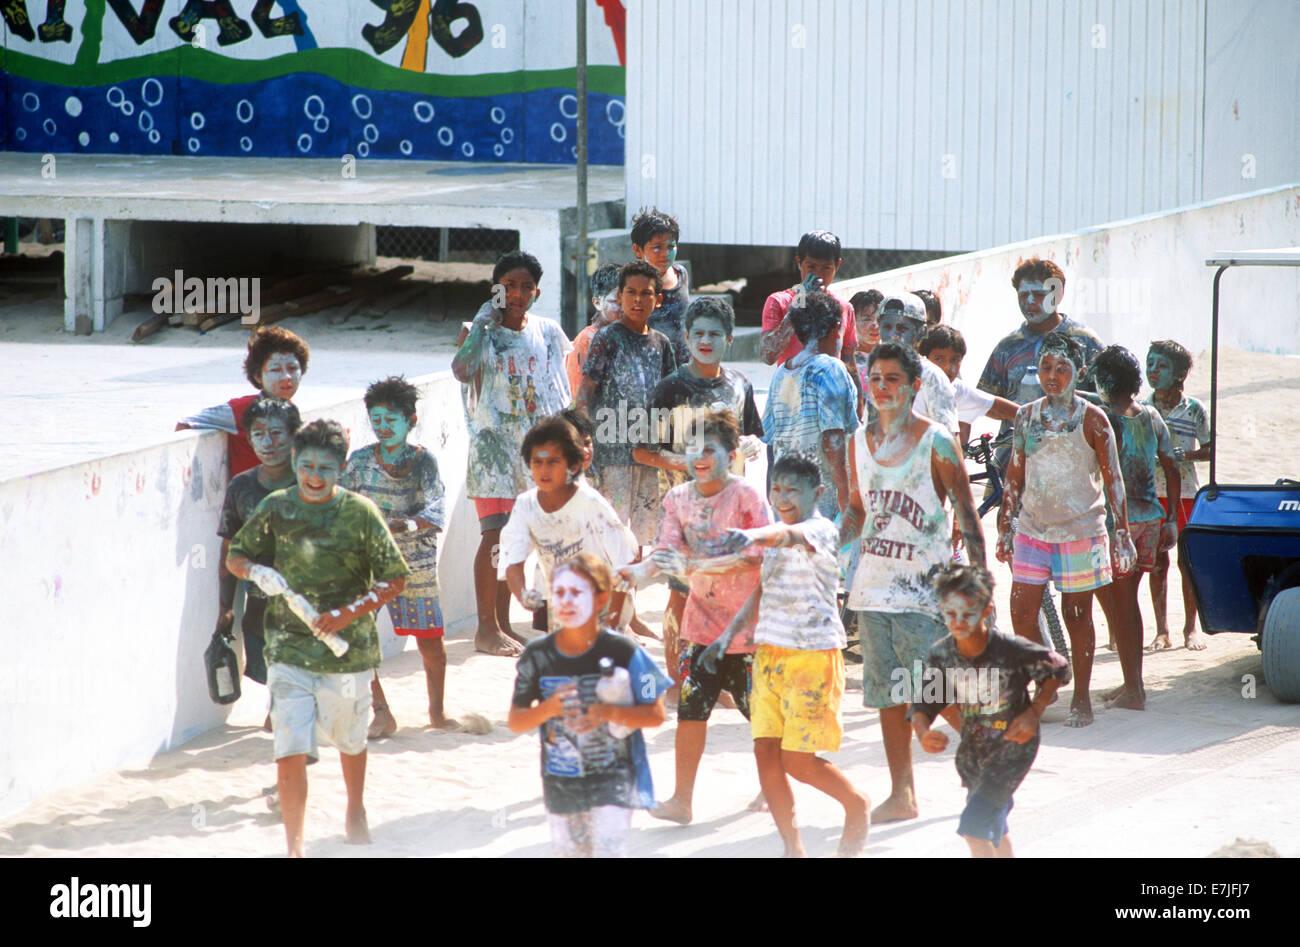 San Pedro, Carnival, Ambergris Caye, Belize - Stock Image